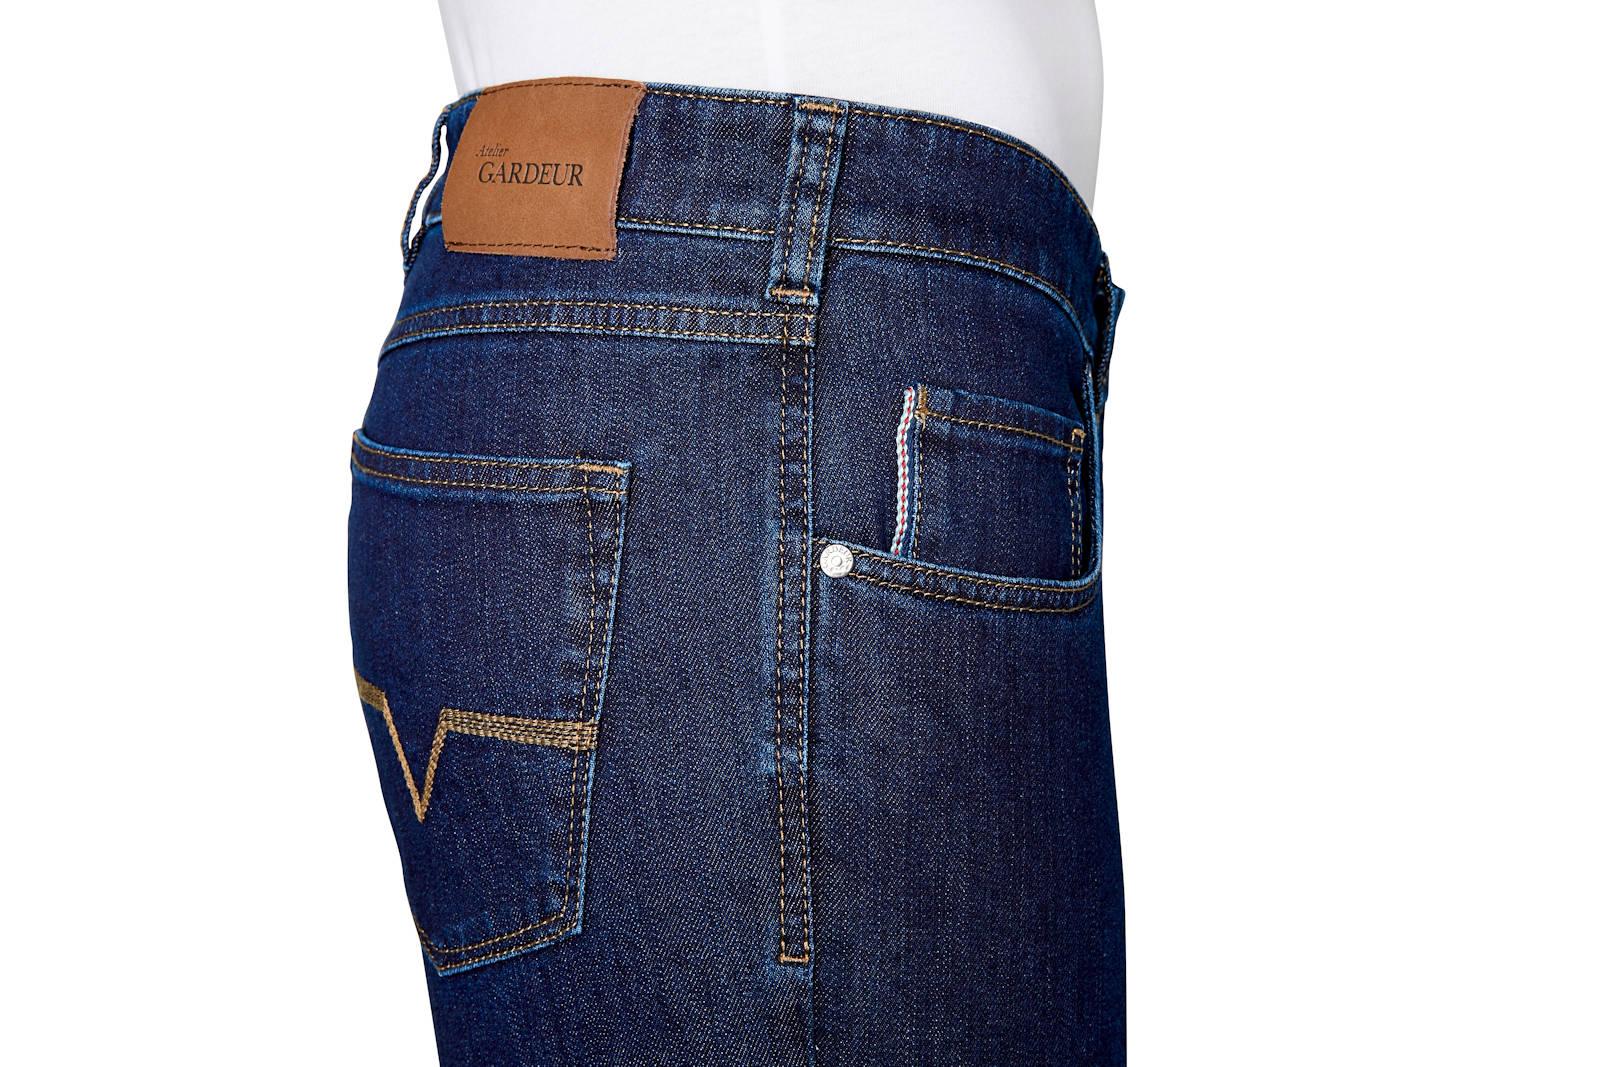 Atelier-GARDEUR-Jeans-NEVIO-11-Regular-Fit-Herren-Hose-Straight-Leg-Denim-NEU Indexbild 9